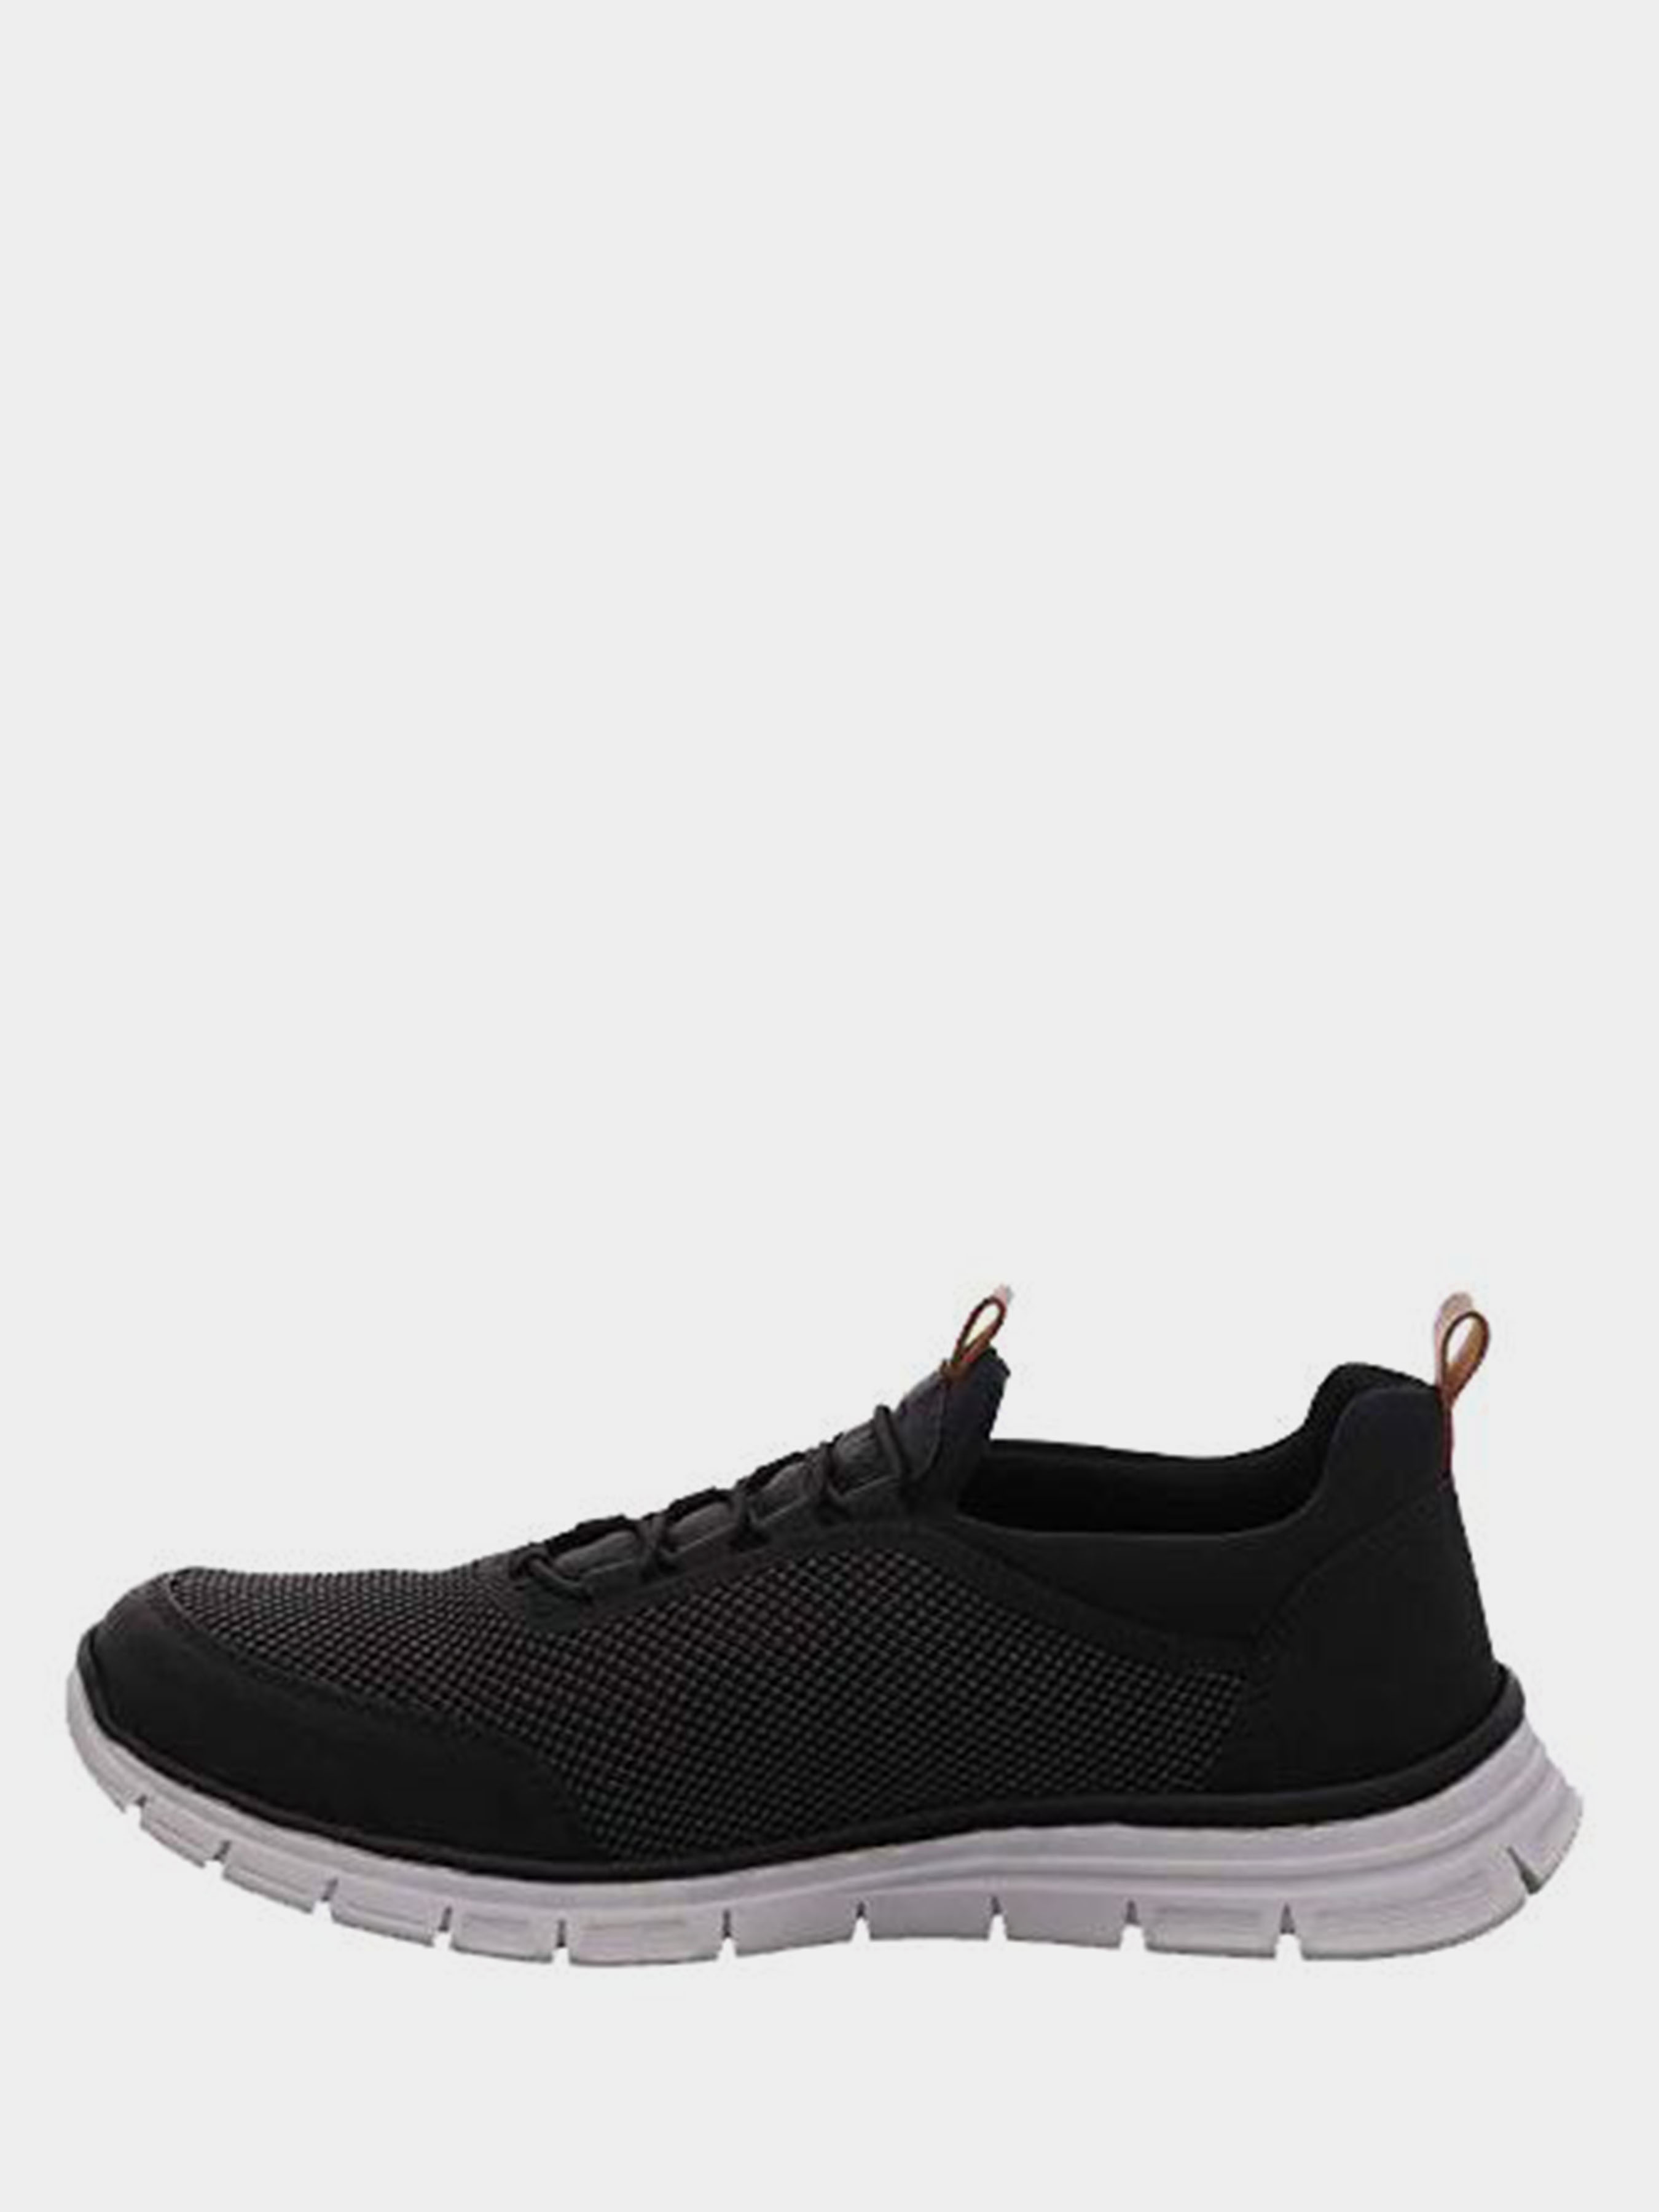 Кроссовки для мужчин RIEKER RK655 купить в Интертоп, 2017